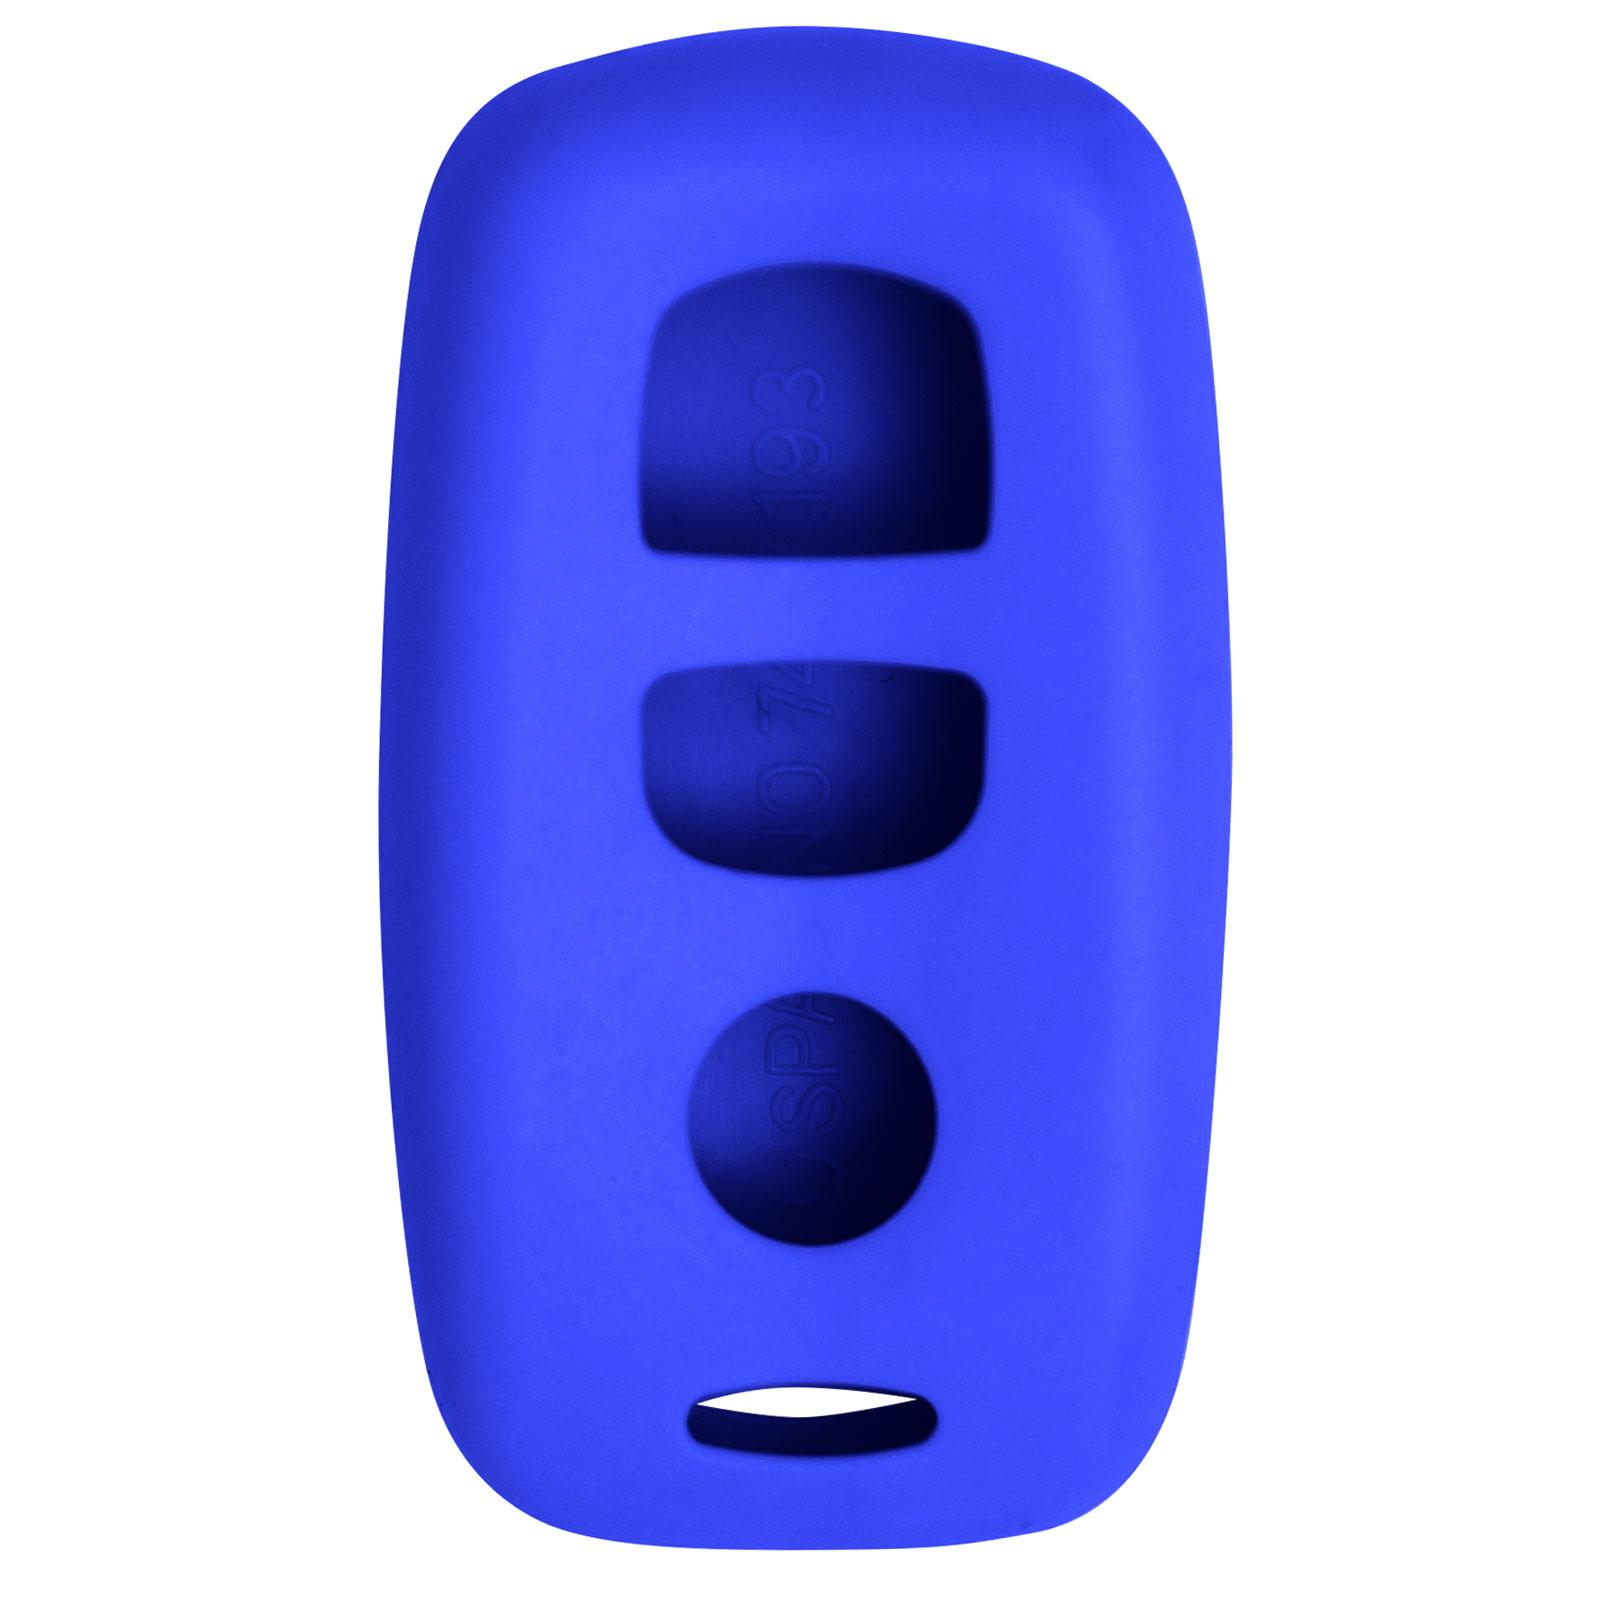 Keyless2Go New Silicone Cover Protective Case for Mazda Remote with FCC KPU41846 KPU41794